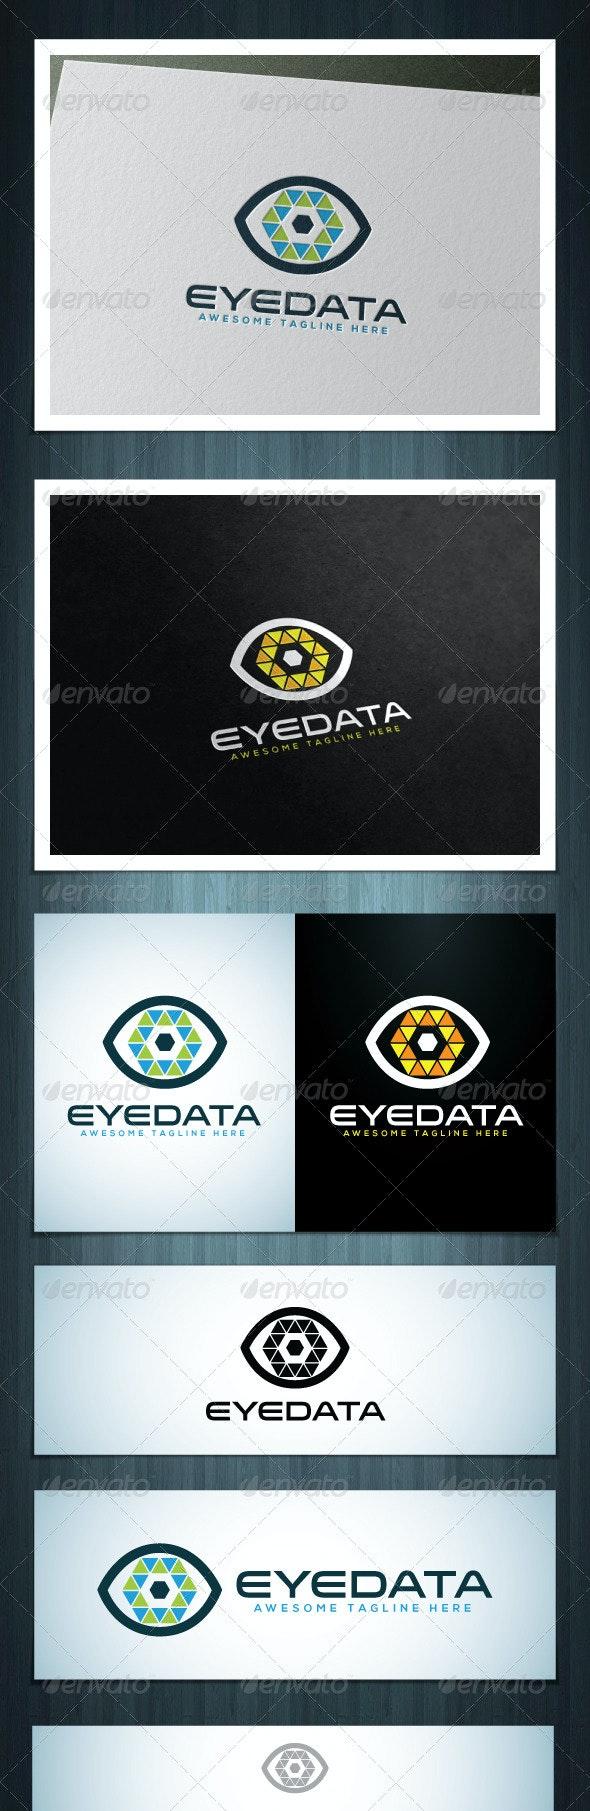 EyeData - Vector Abstract